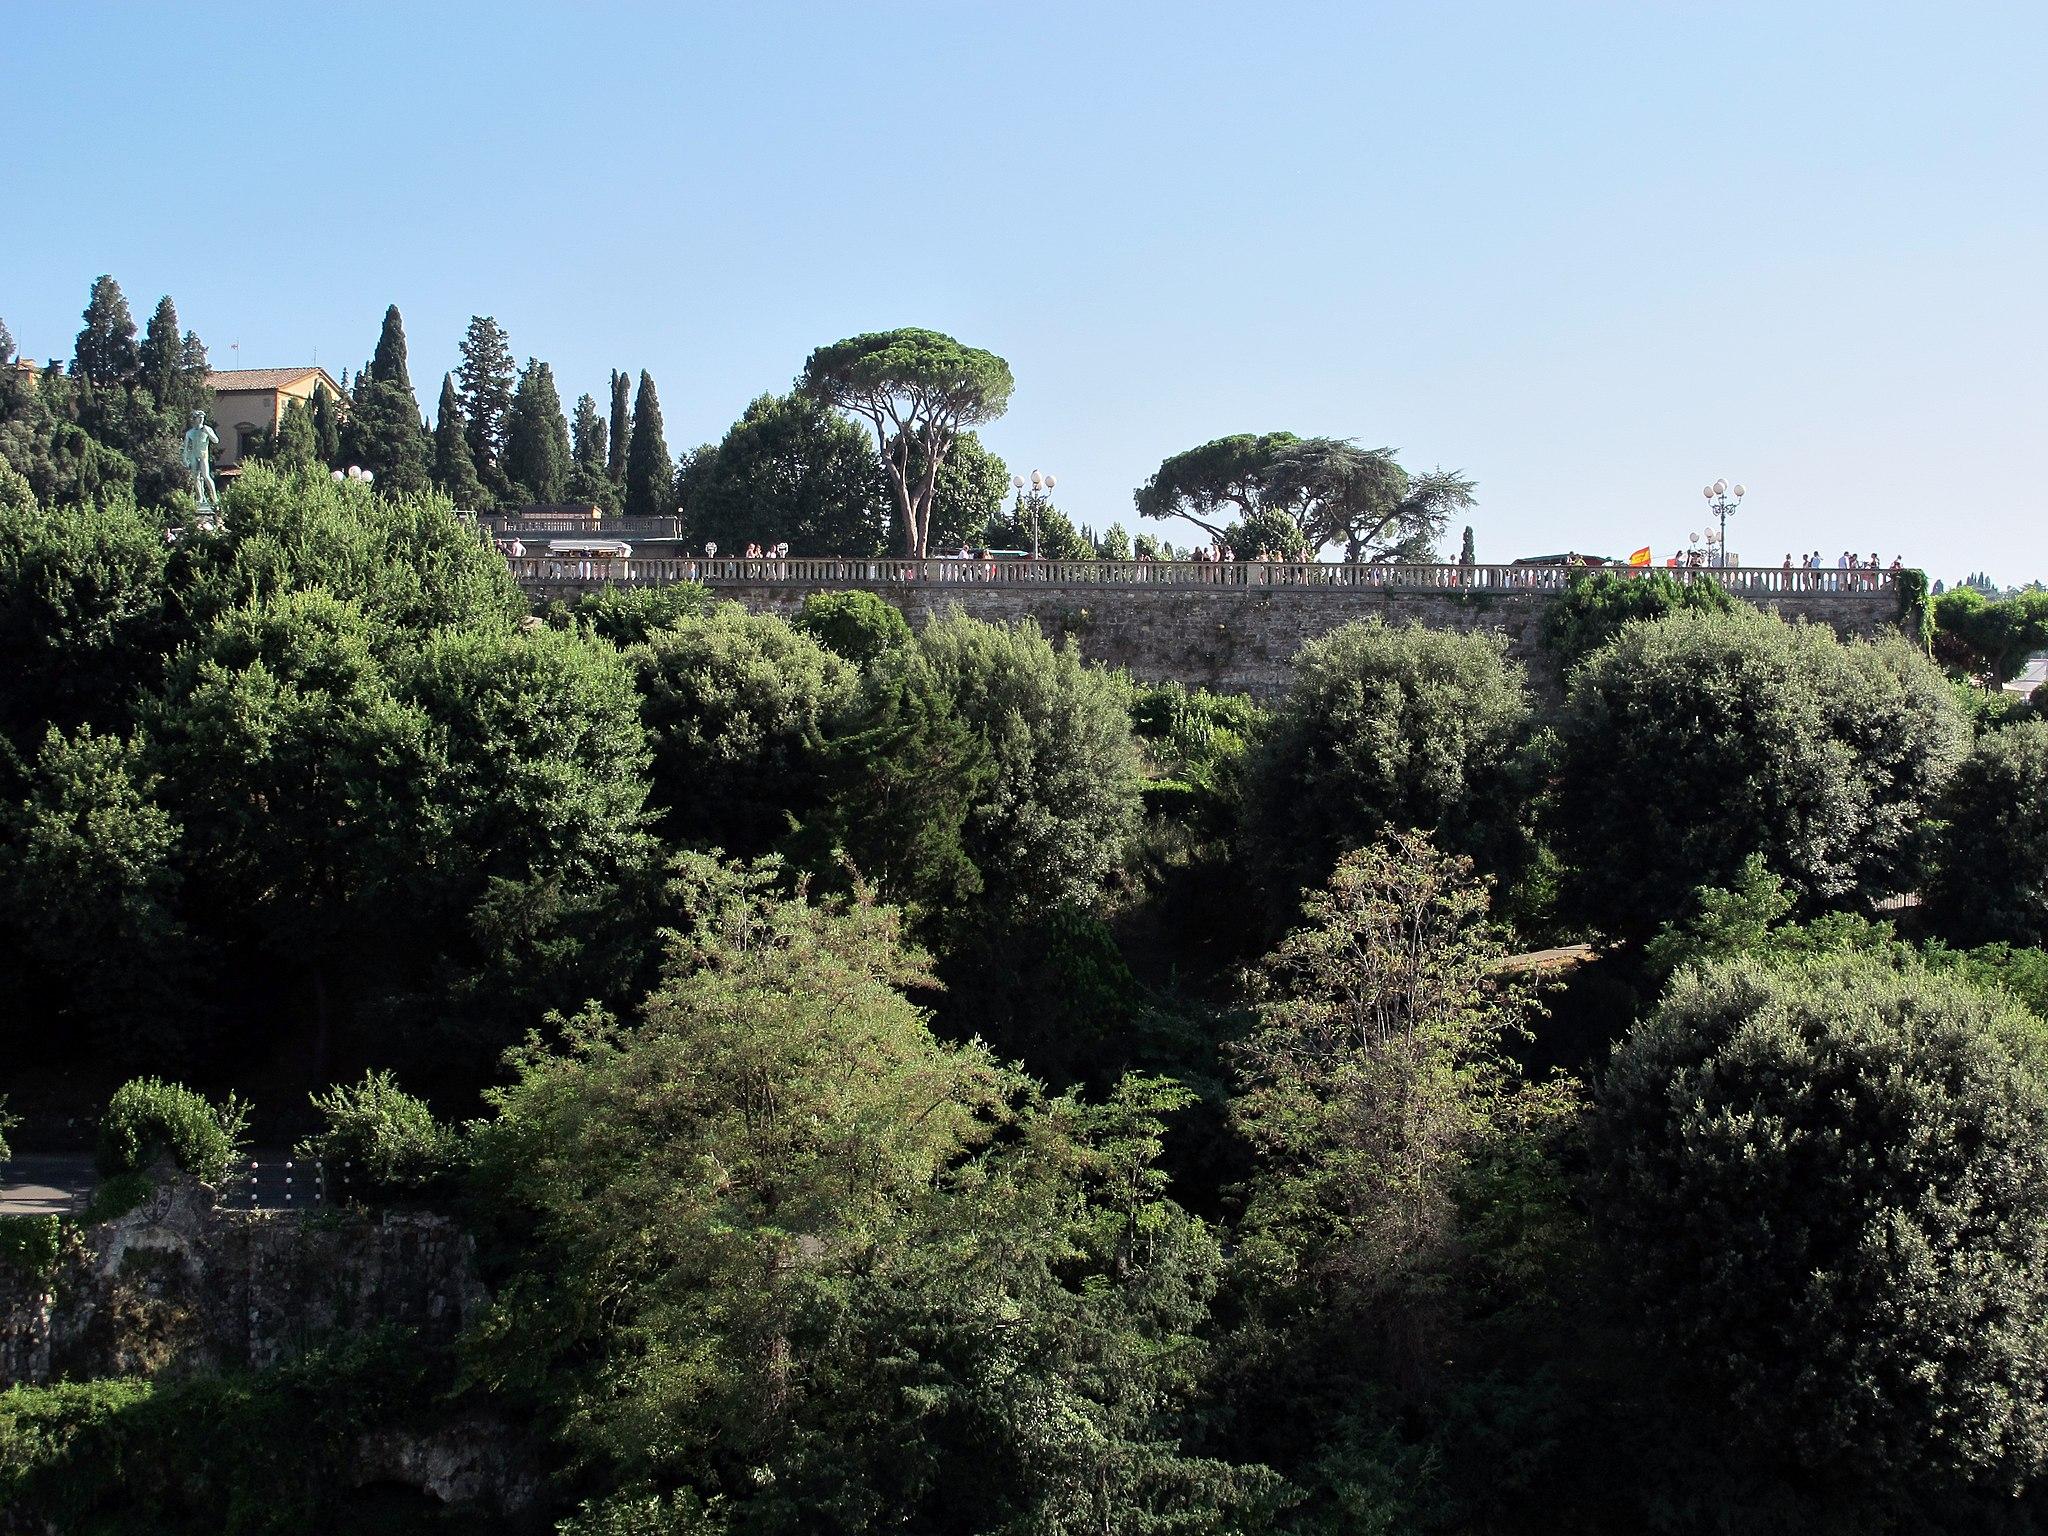 Piazzale michelangelo, veduta dalla Torre San Niccolò